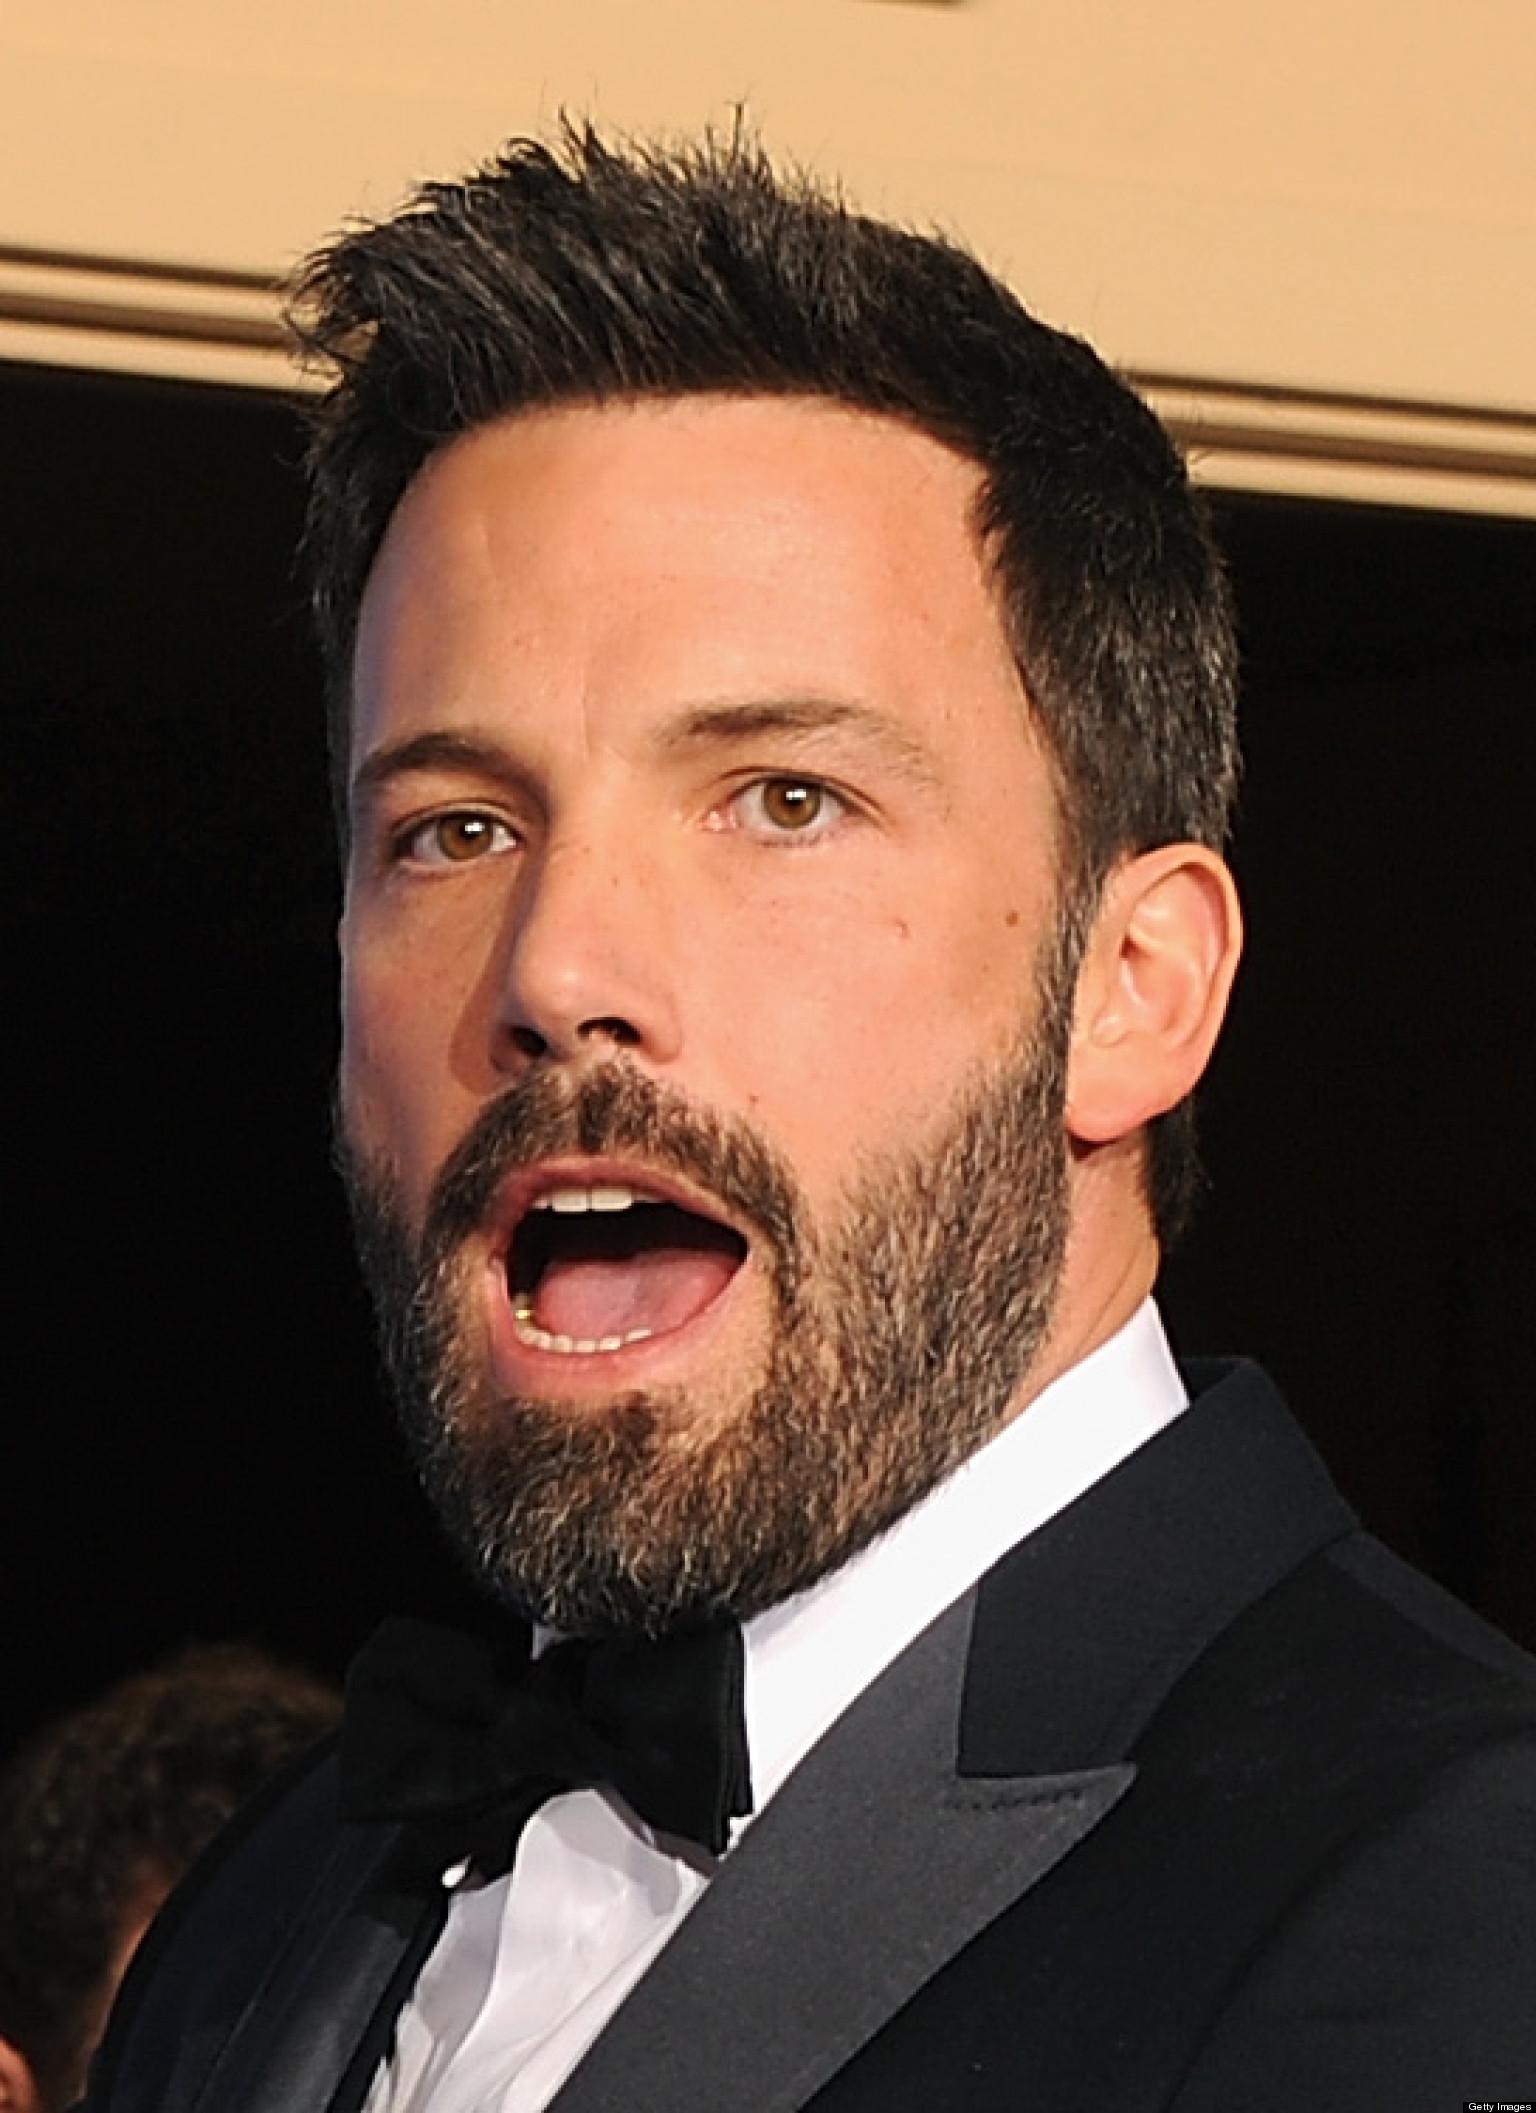 Ben Affleck, Best Director? Snubbed 'Argo' Filmmaker & A Possible ... Ben Affleck